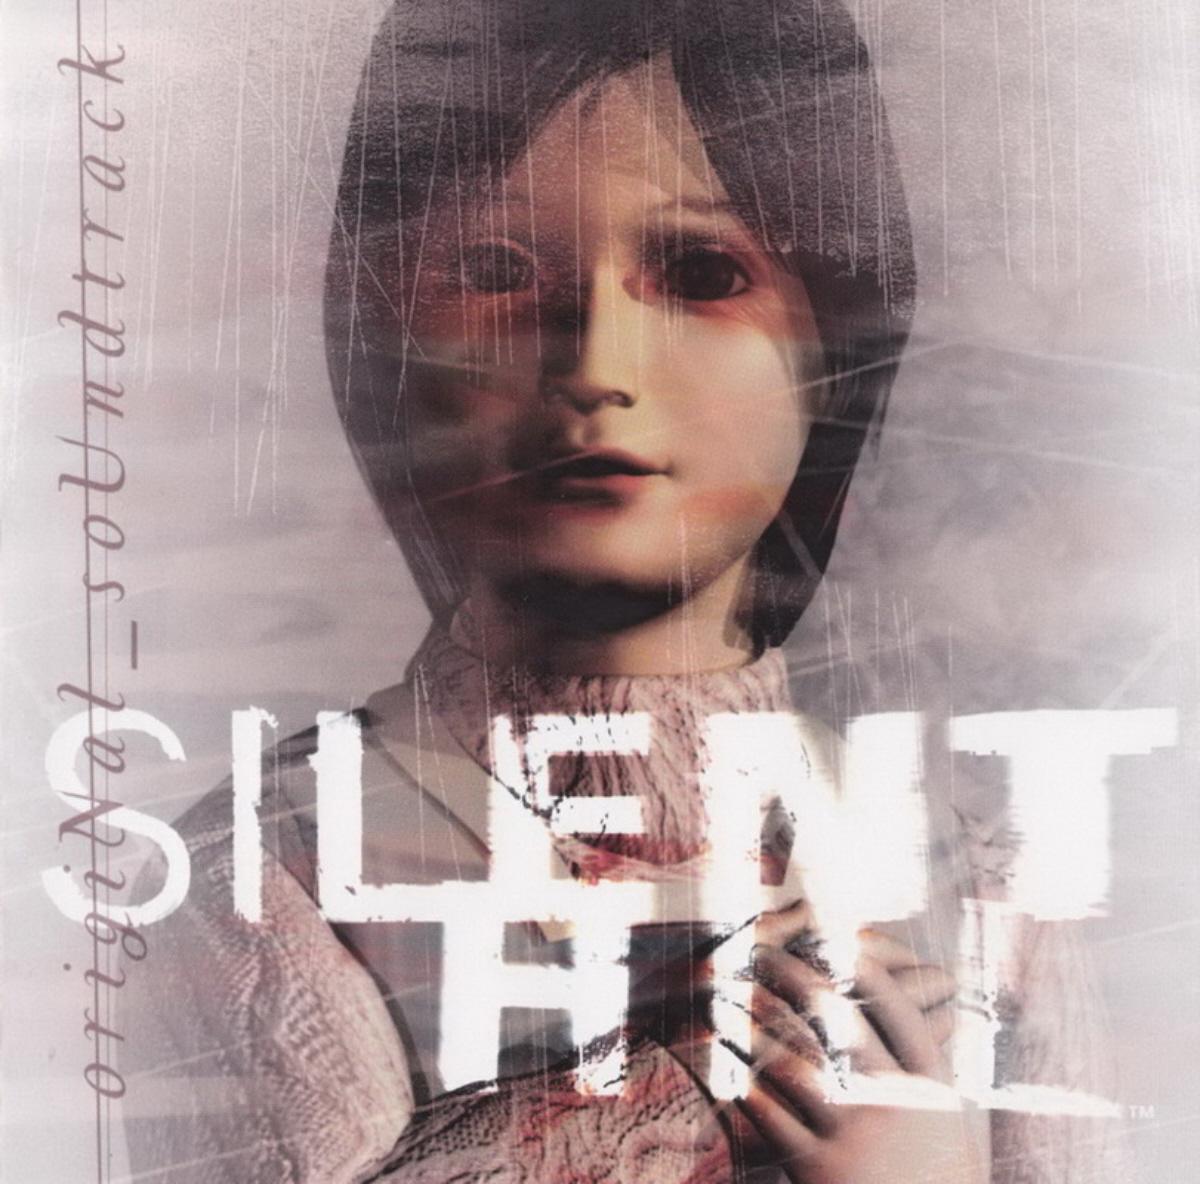 Silent Hill 1 Psx Videogame Soundtrack Download Free Episode